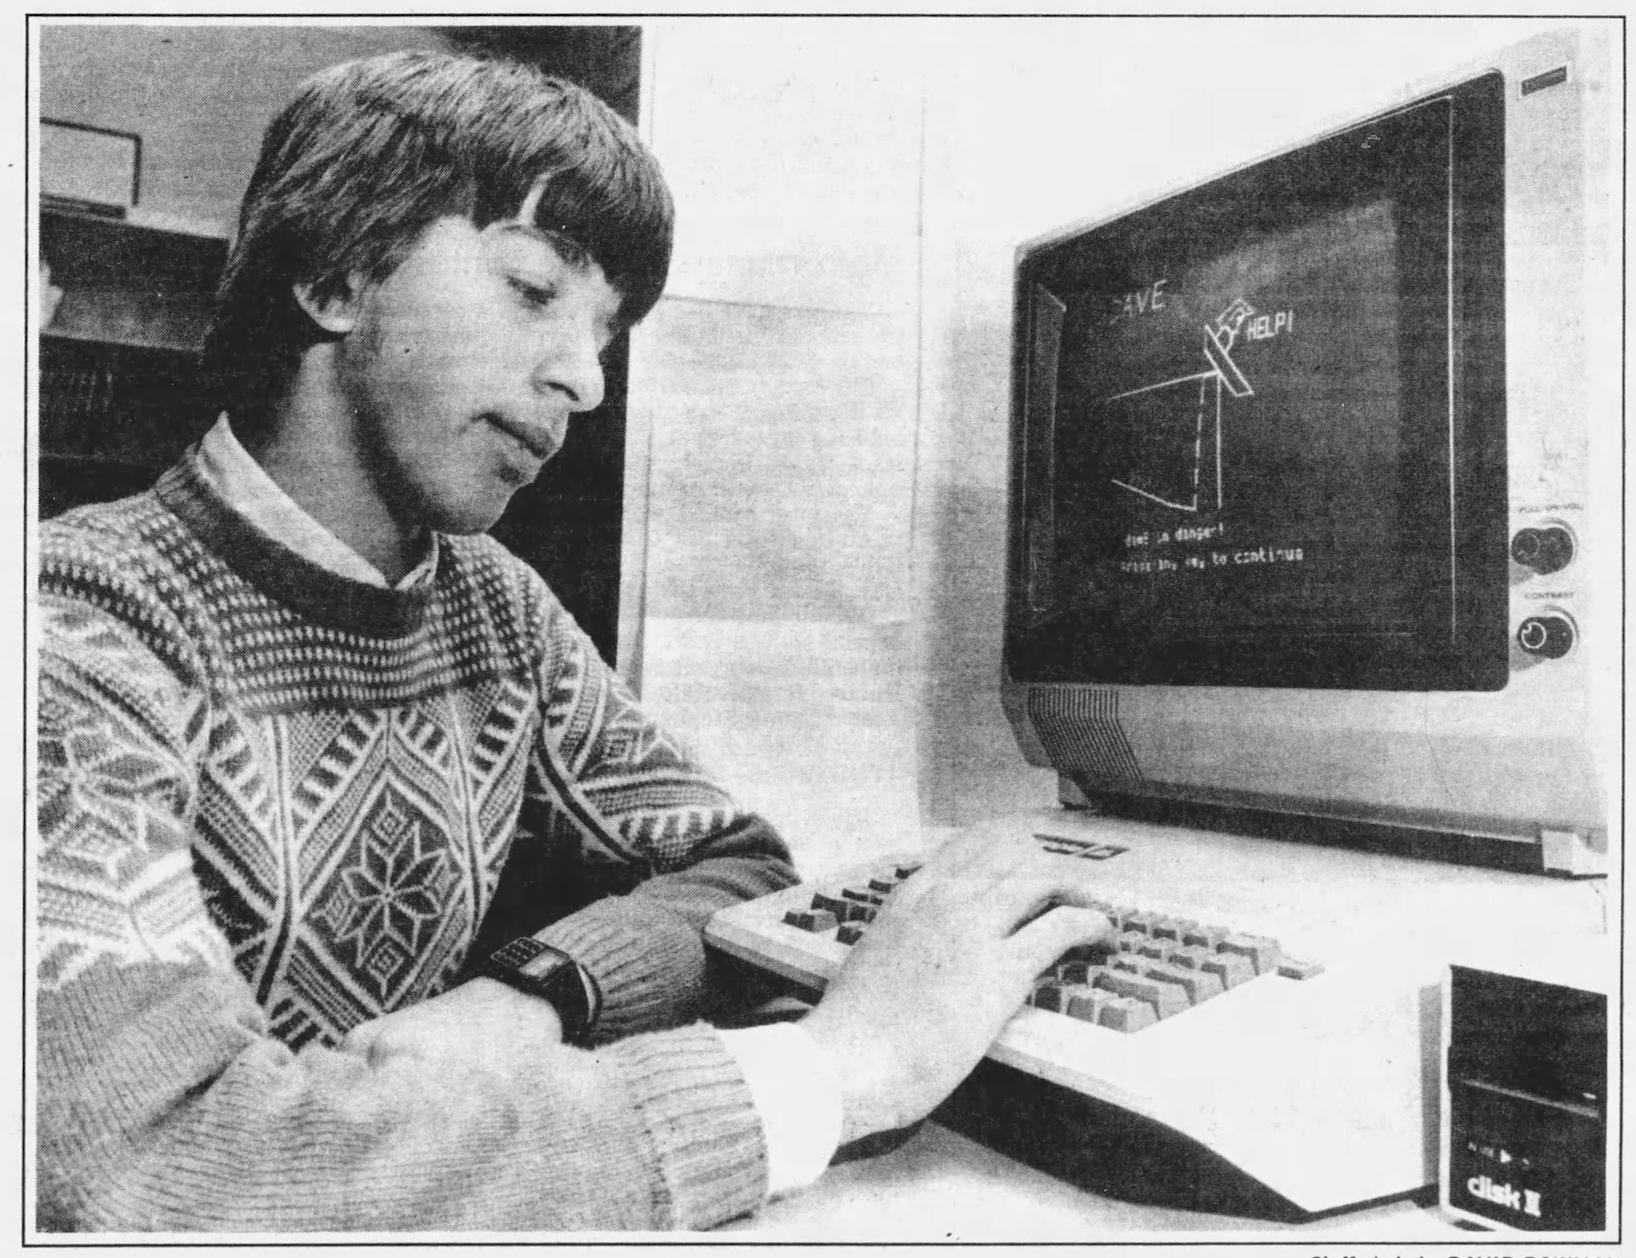 ANTIC Interview 406 - Atari at the Science Fair: Michael Fripp, Silent E